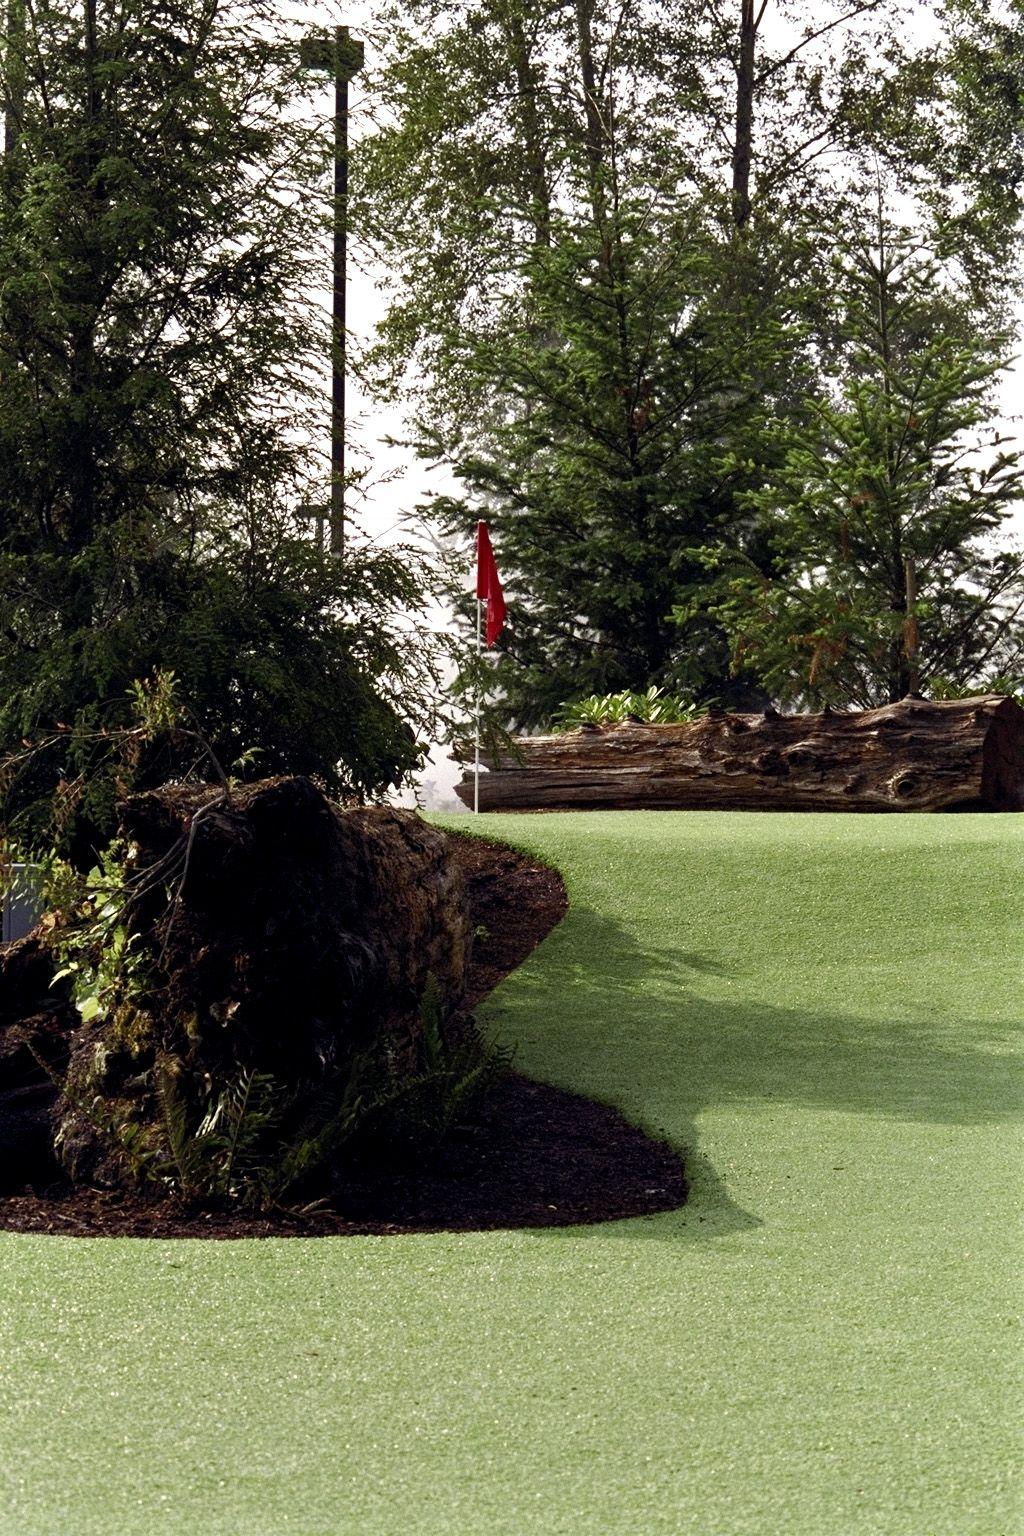 Rainbow Run Putting Course - Willows Run Golf Course